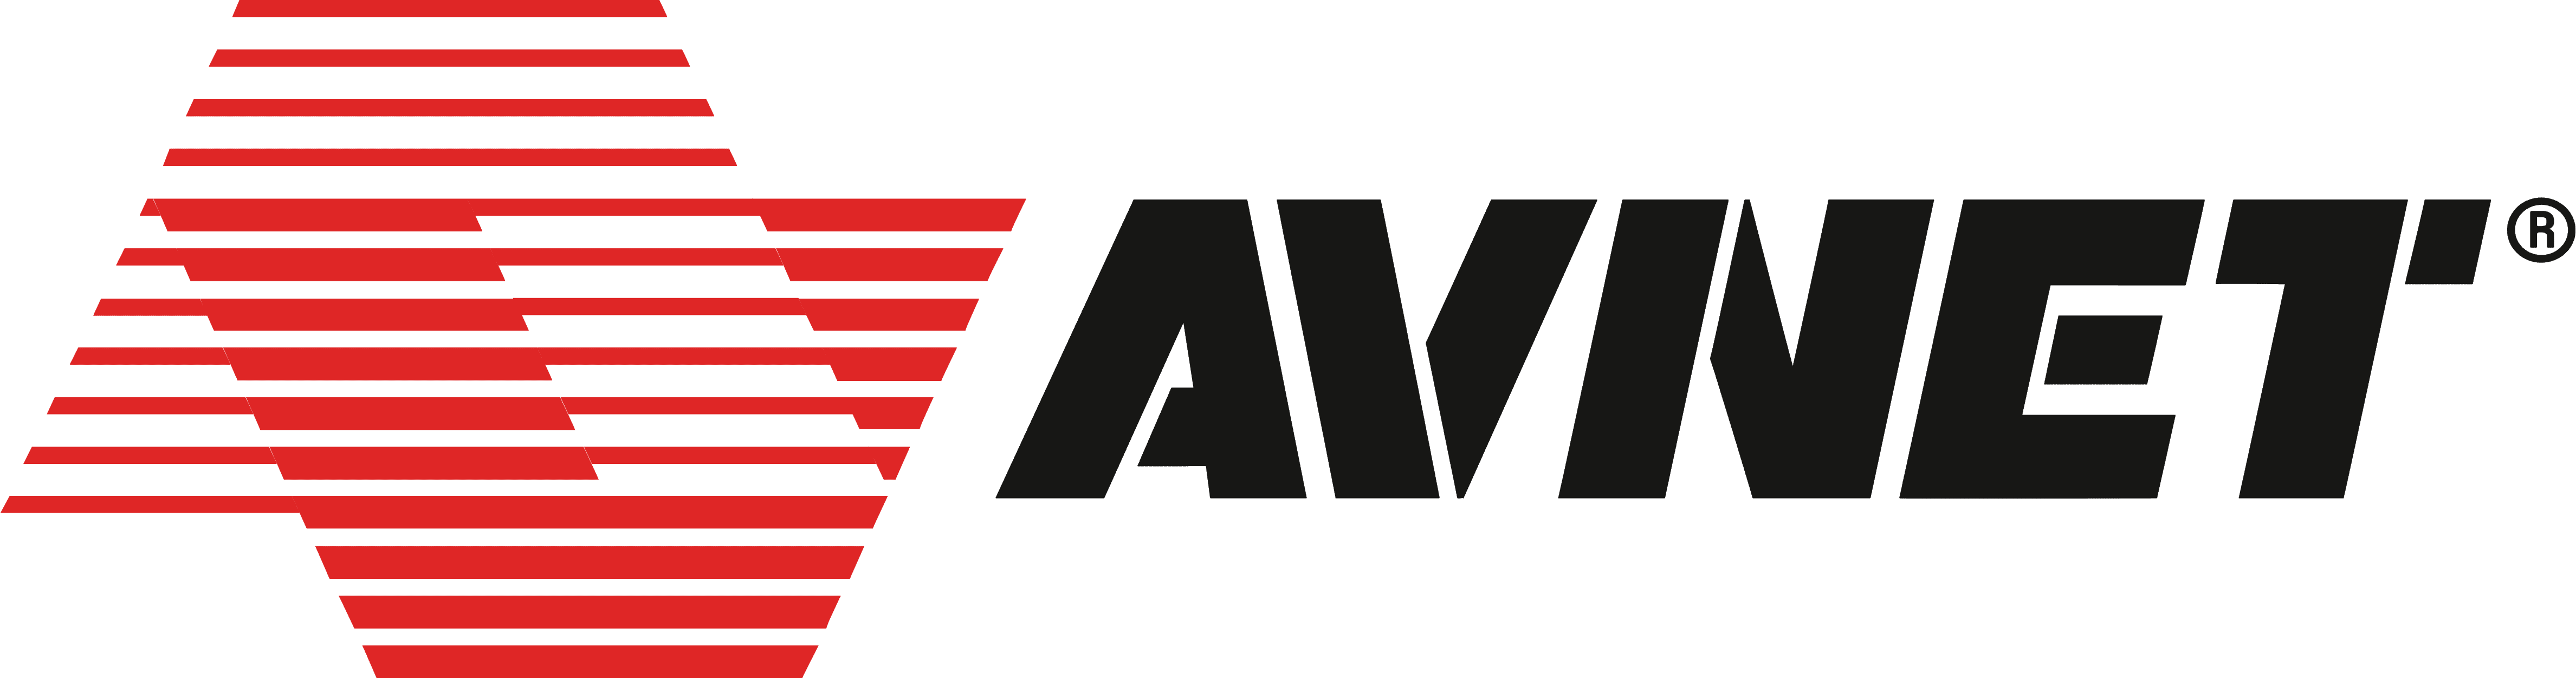 Avnet_logo_logotipo